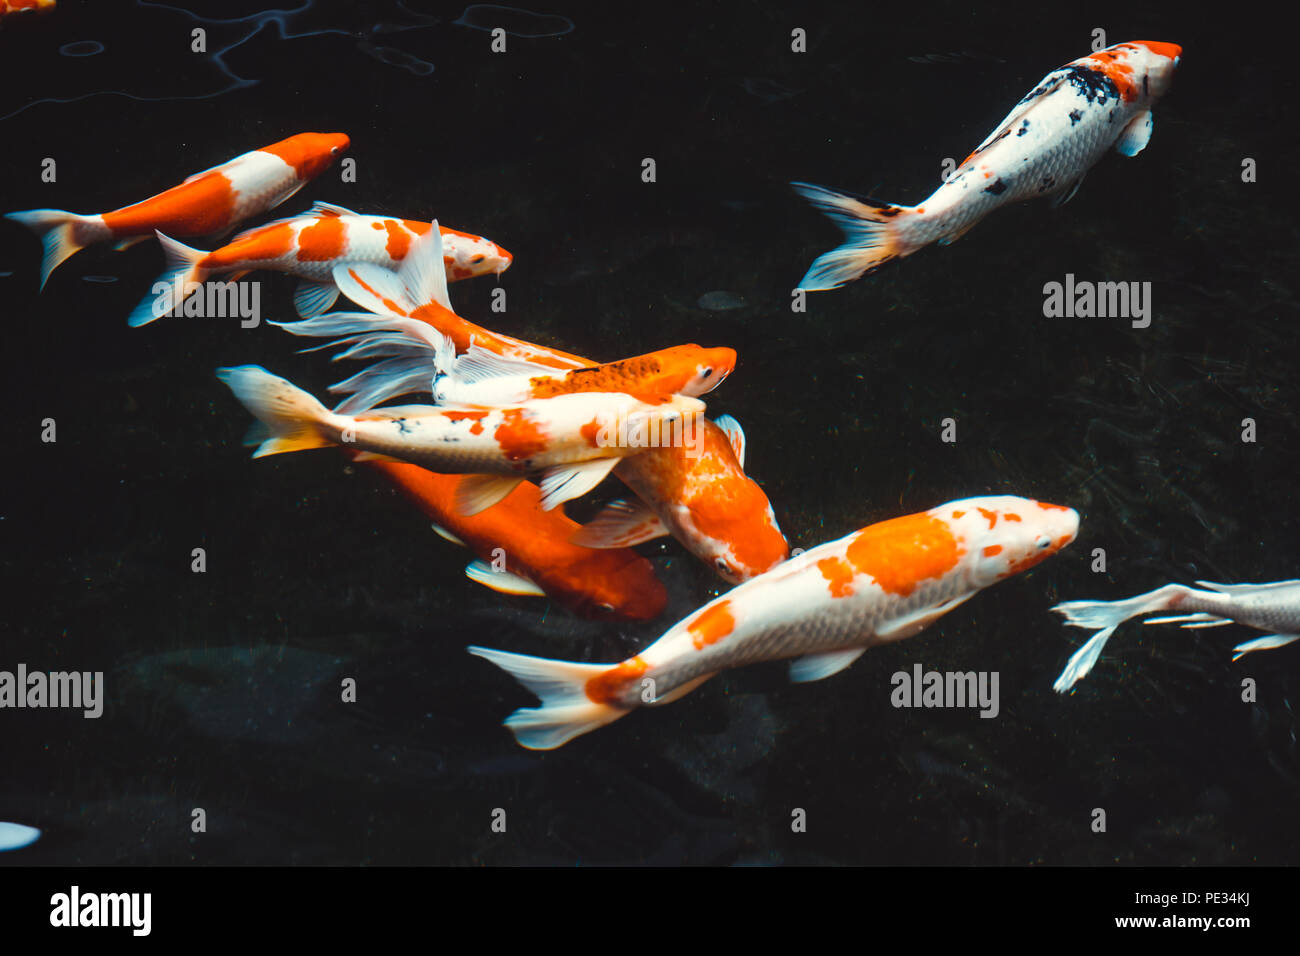 Koi Fish Illustration Stockfotos & Koi Fish Illustration Bilder ...